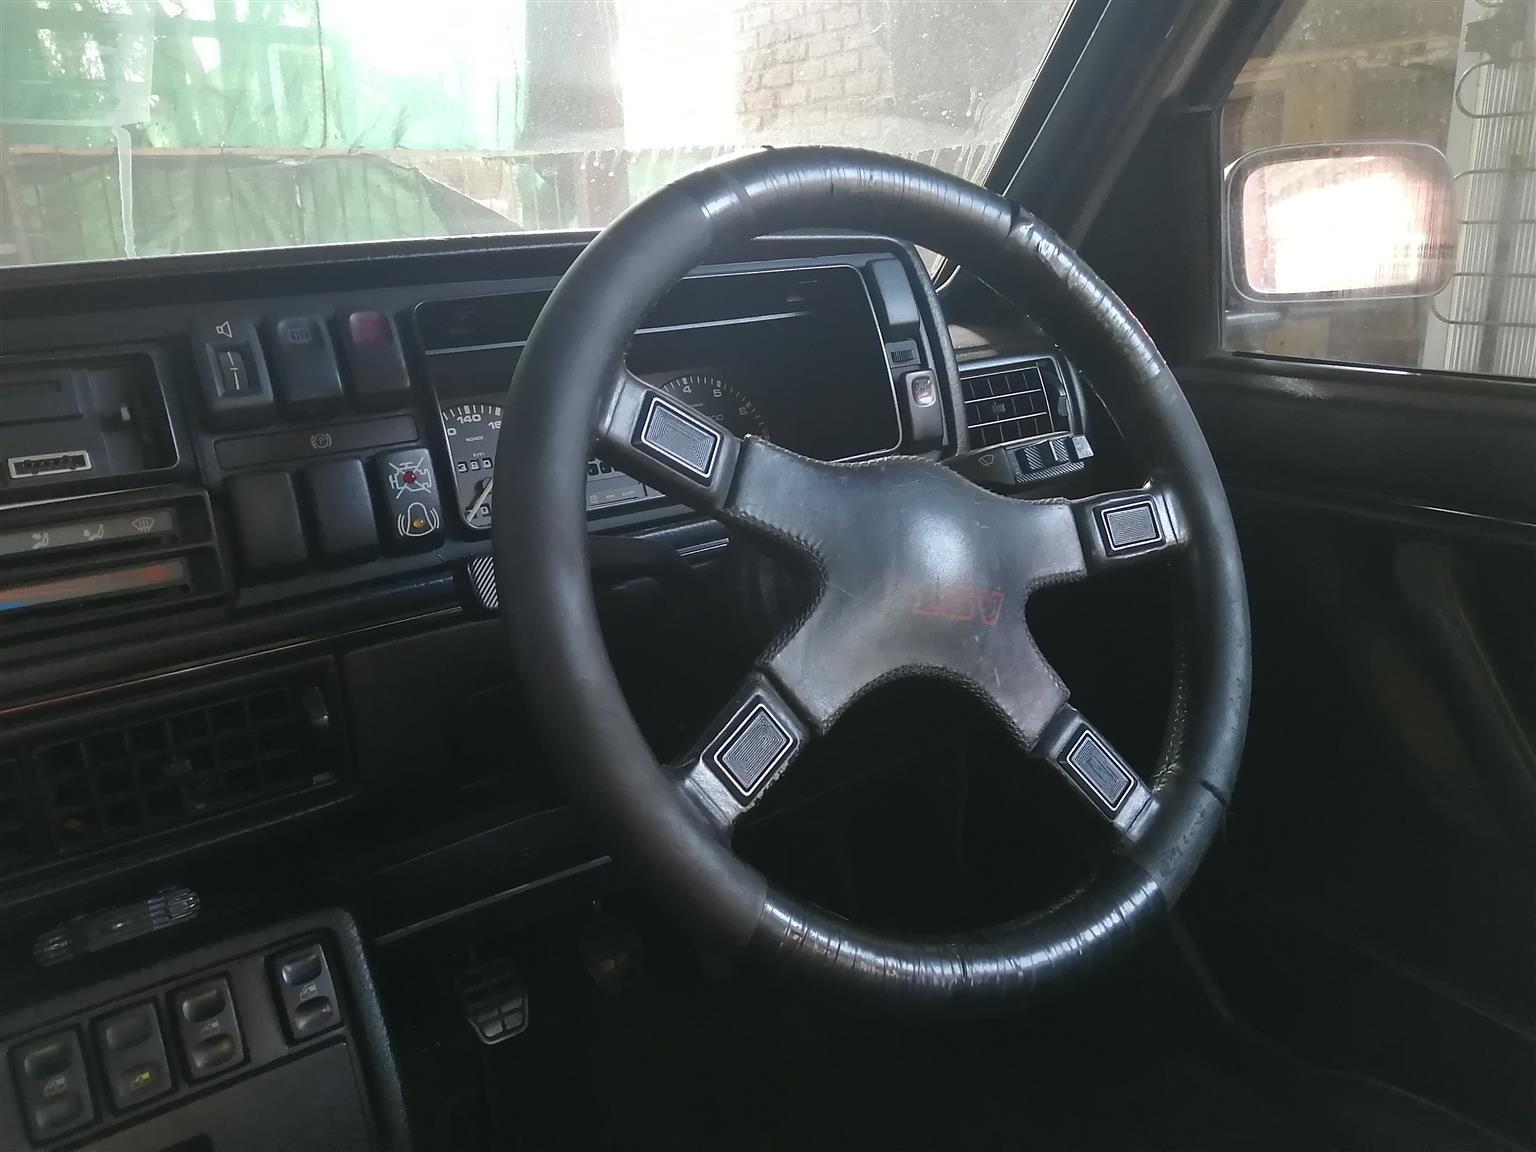 1988 VW Jetta 1.8T Executive